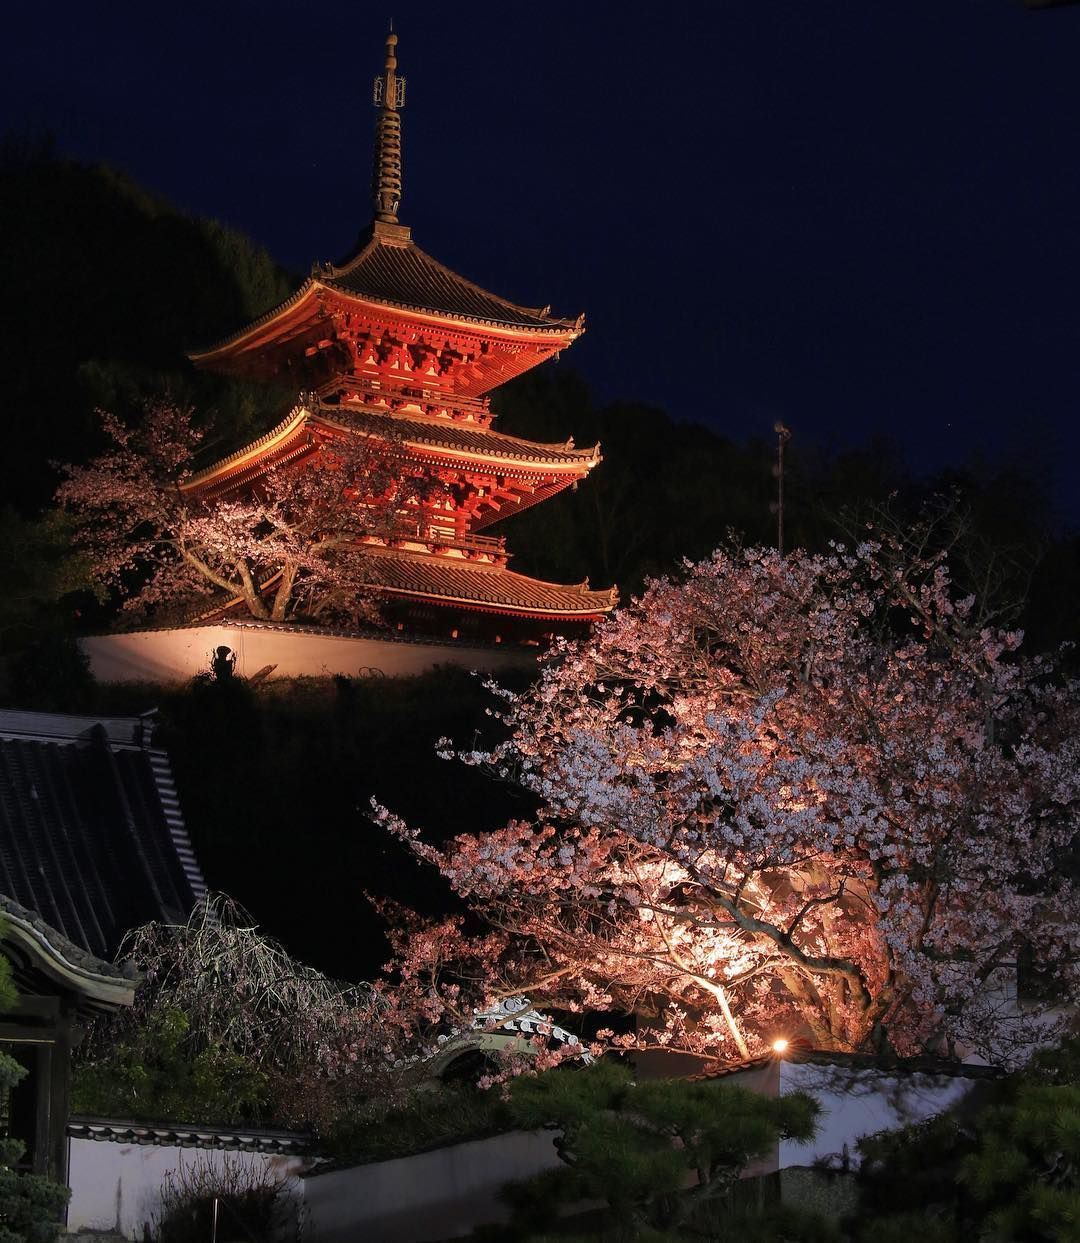 location 西国寺  一夜限りのライトアップ  Date 2016.4.2  #team_jp#team_jp_西#team_jp_春色#lovers_nippon#loves_nippon#canon#canon_photos#igers#IGersip#ig_japan#icu_japan#japan_night_view#bestjapanpics#igworldclub#ig_worldclub#snapshot#special_shots#worldbestshot#尾道#onomichi#scenery#landscape#igscglobal#turkinstagram#cherryblossom#japan by ce5dmk3